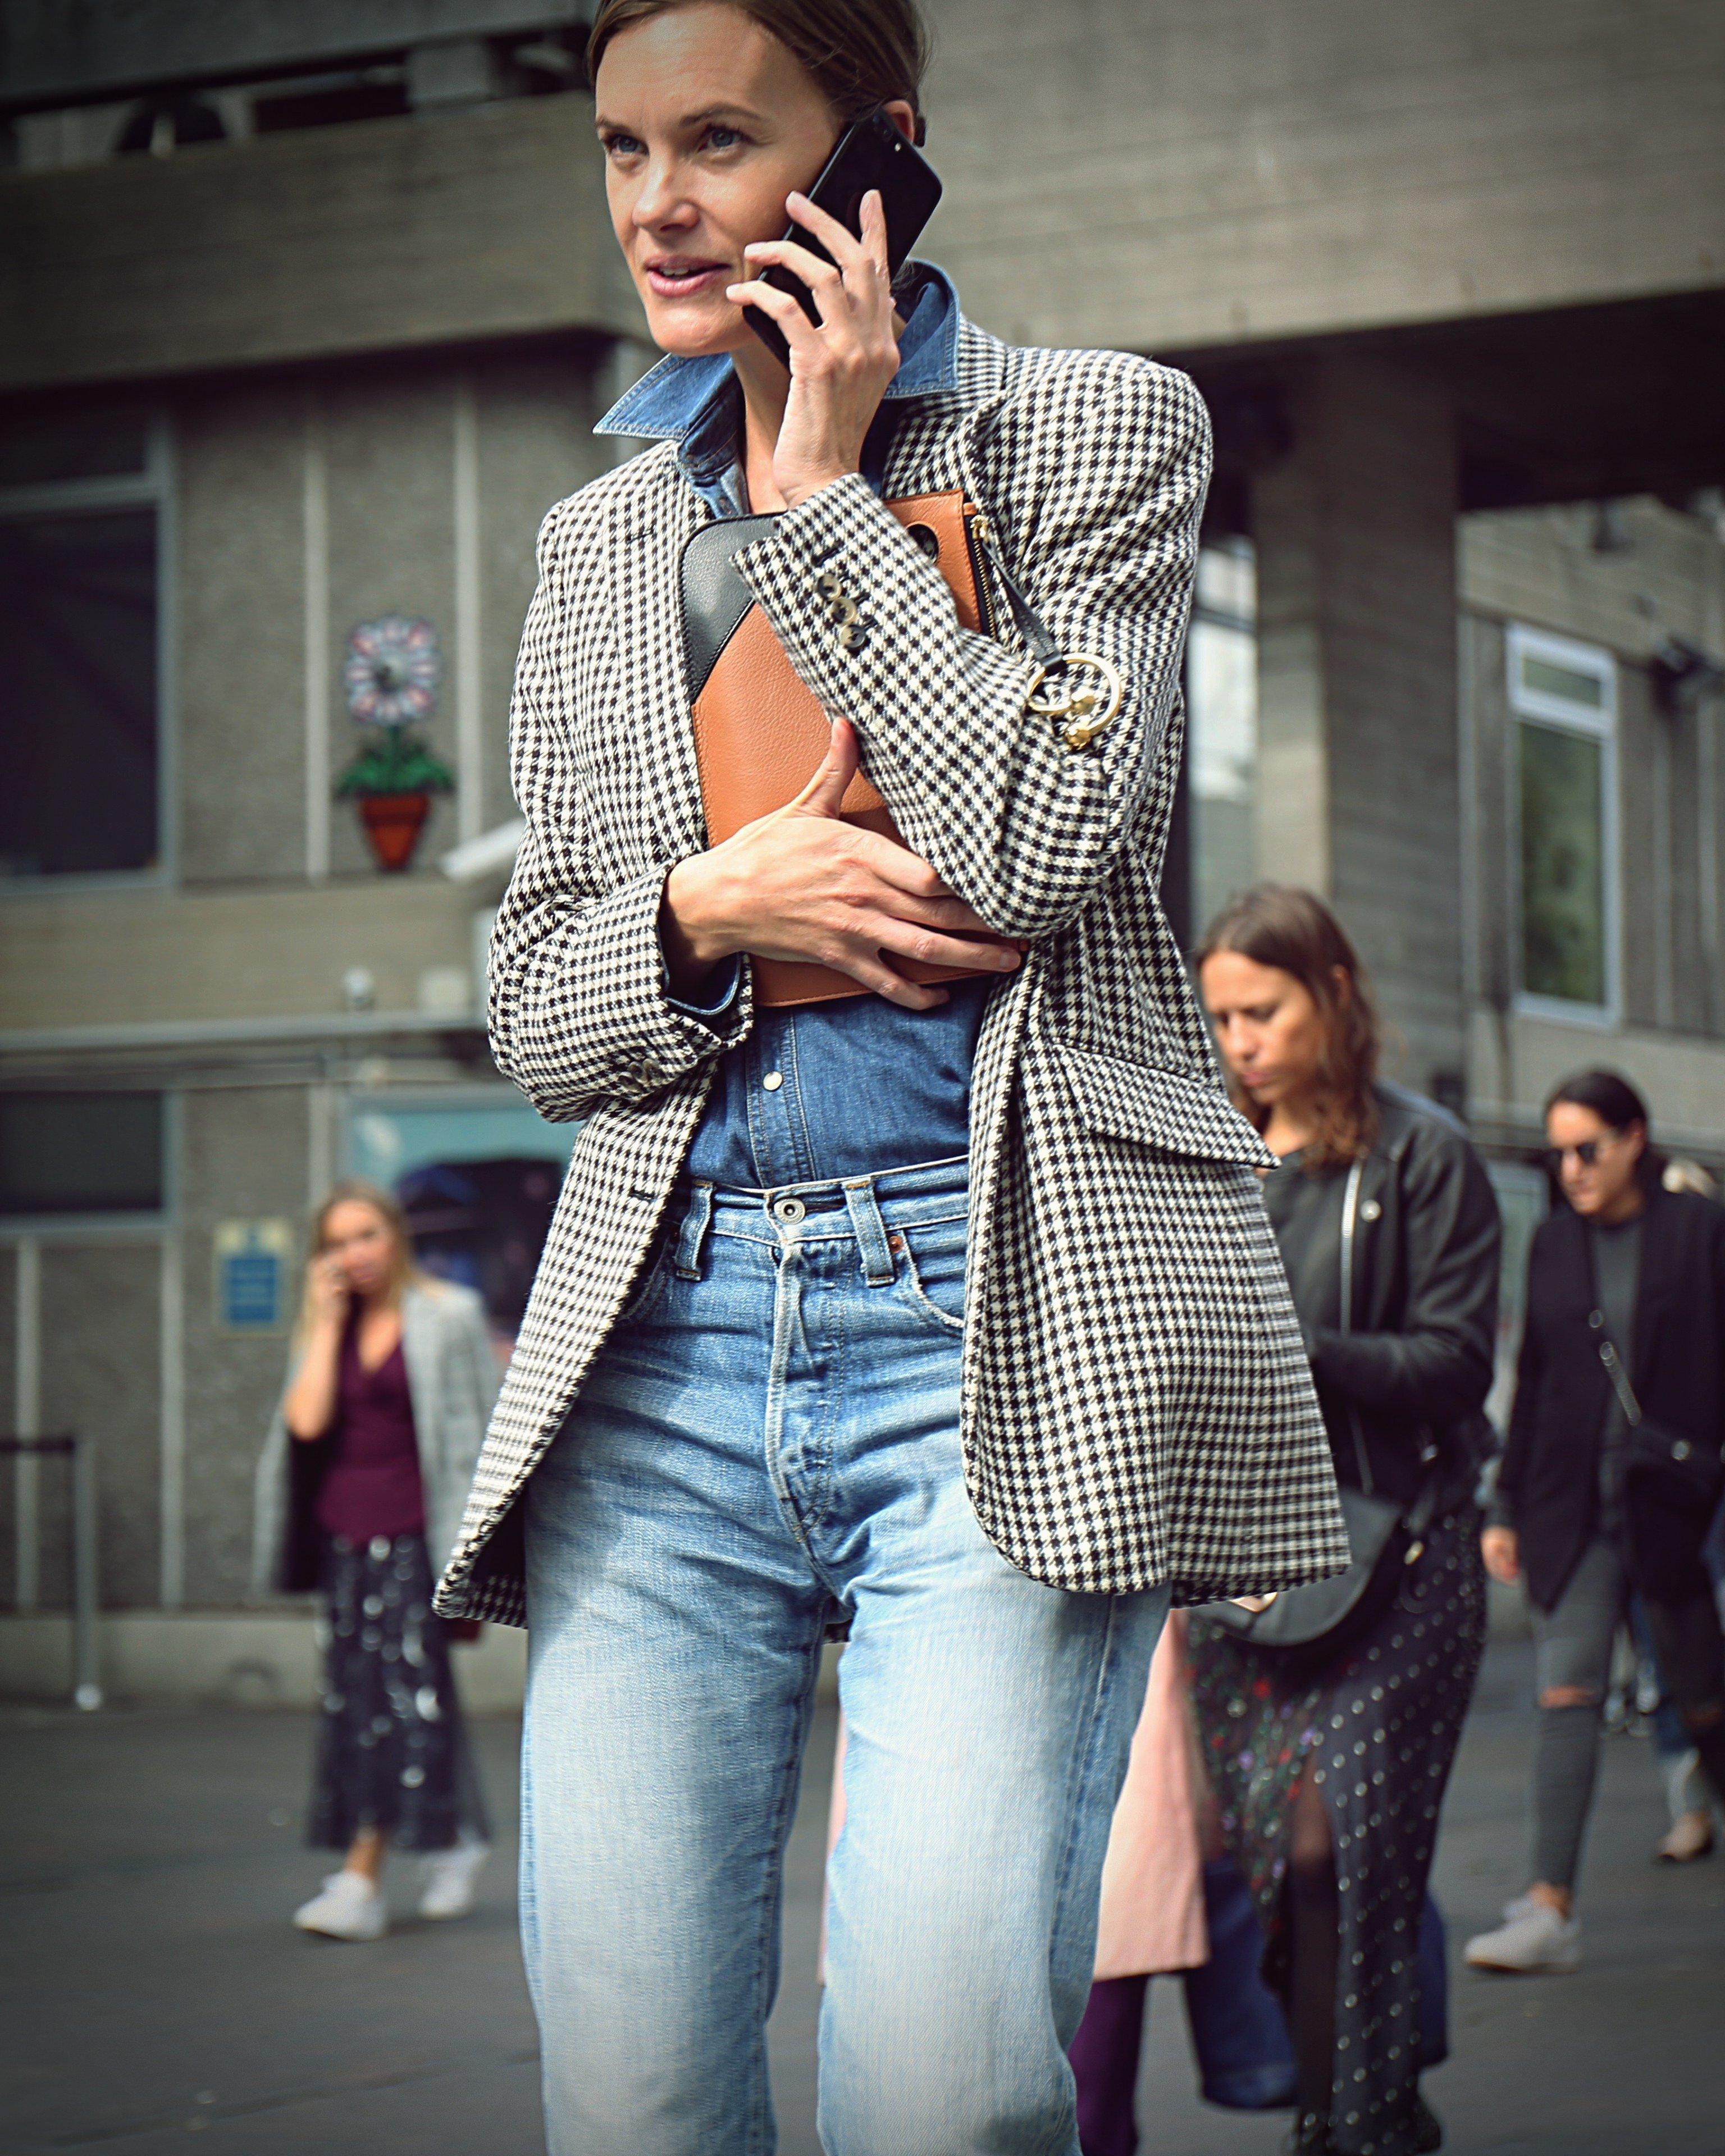 September 17, 2017 - London, United Kingdom - LONDON- 17 September 2017 Jo Ellison on the street during the London Fashion Week, Image: 356045620, License: Rights-managed, Restrictions: , Model Release: no, Credit line: Profimedia, Zuma Press - Entertaiment